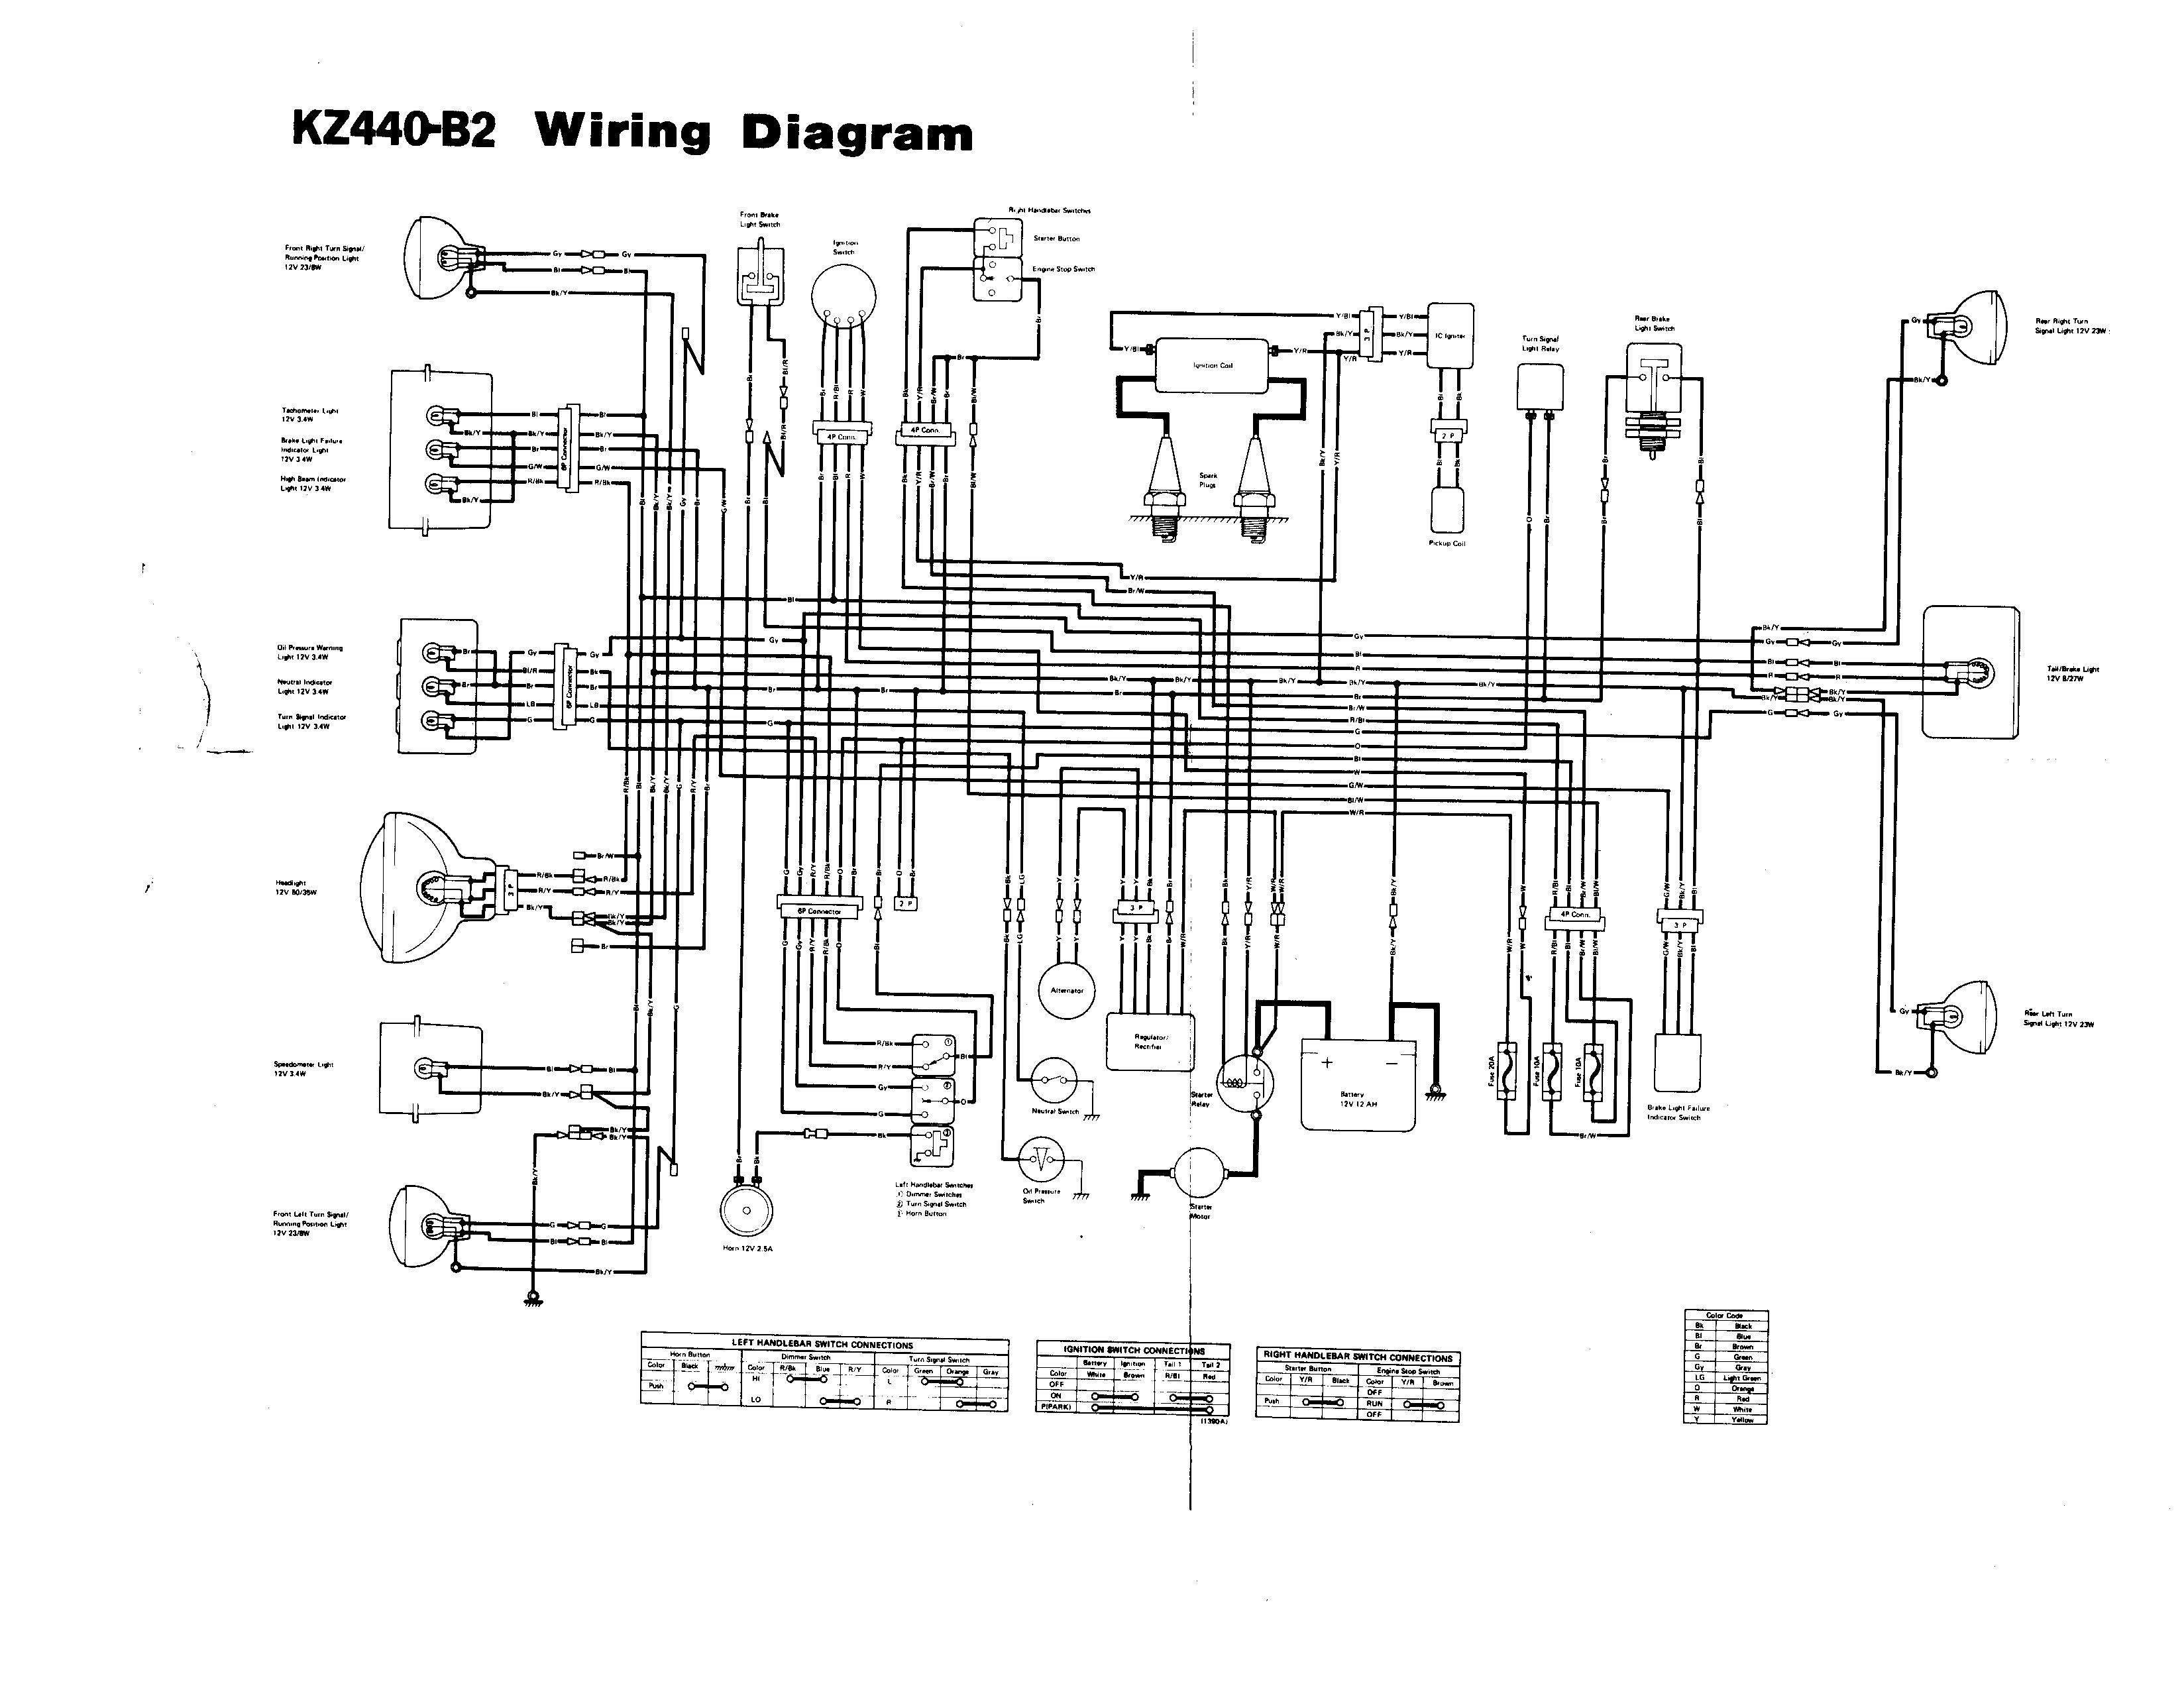 Hyster 50 Forklift Starter Wiring Diagram Xm - Freightliner Fl70 Fuse Panel  Diagram For 97 - tomosa35.tukune.jeanjaures37.fr | Hyster Wiring Diagrams |  | Wiring Diagram Resource